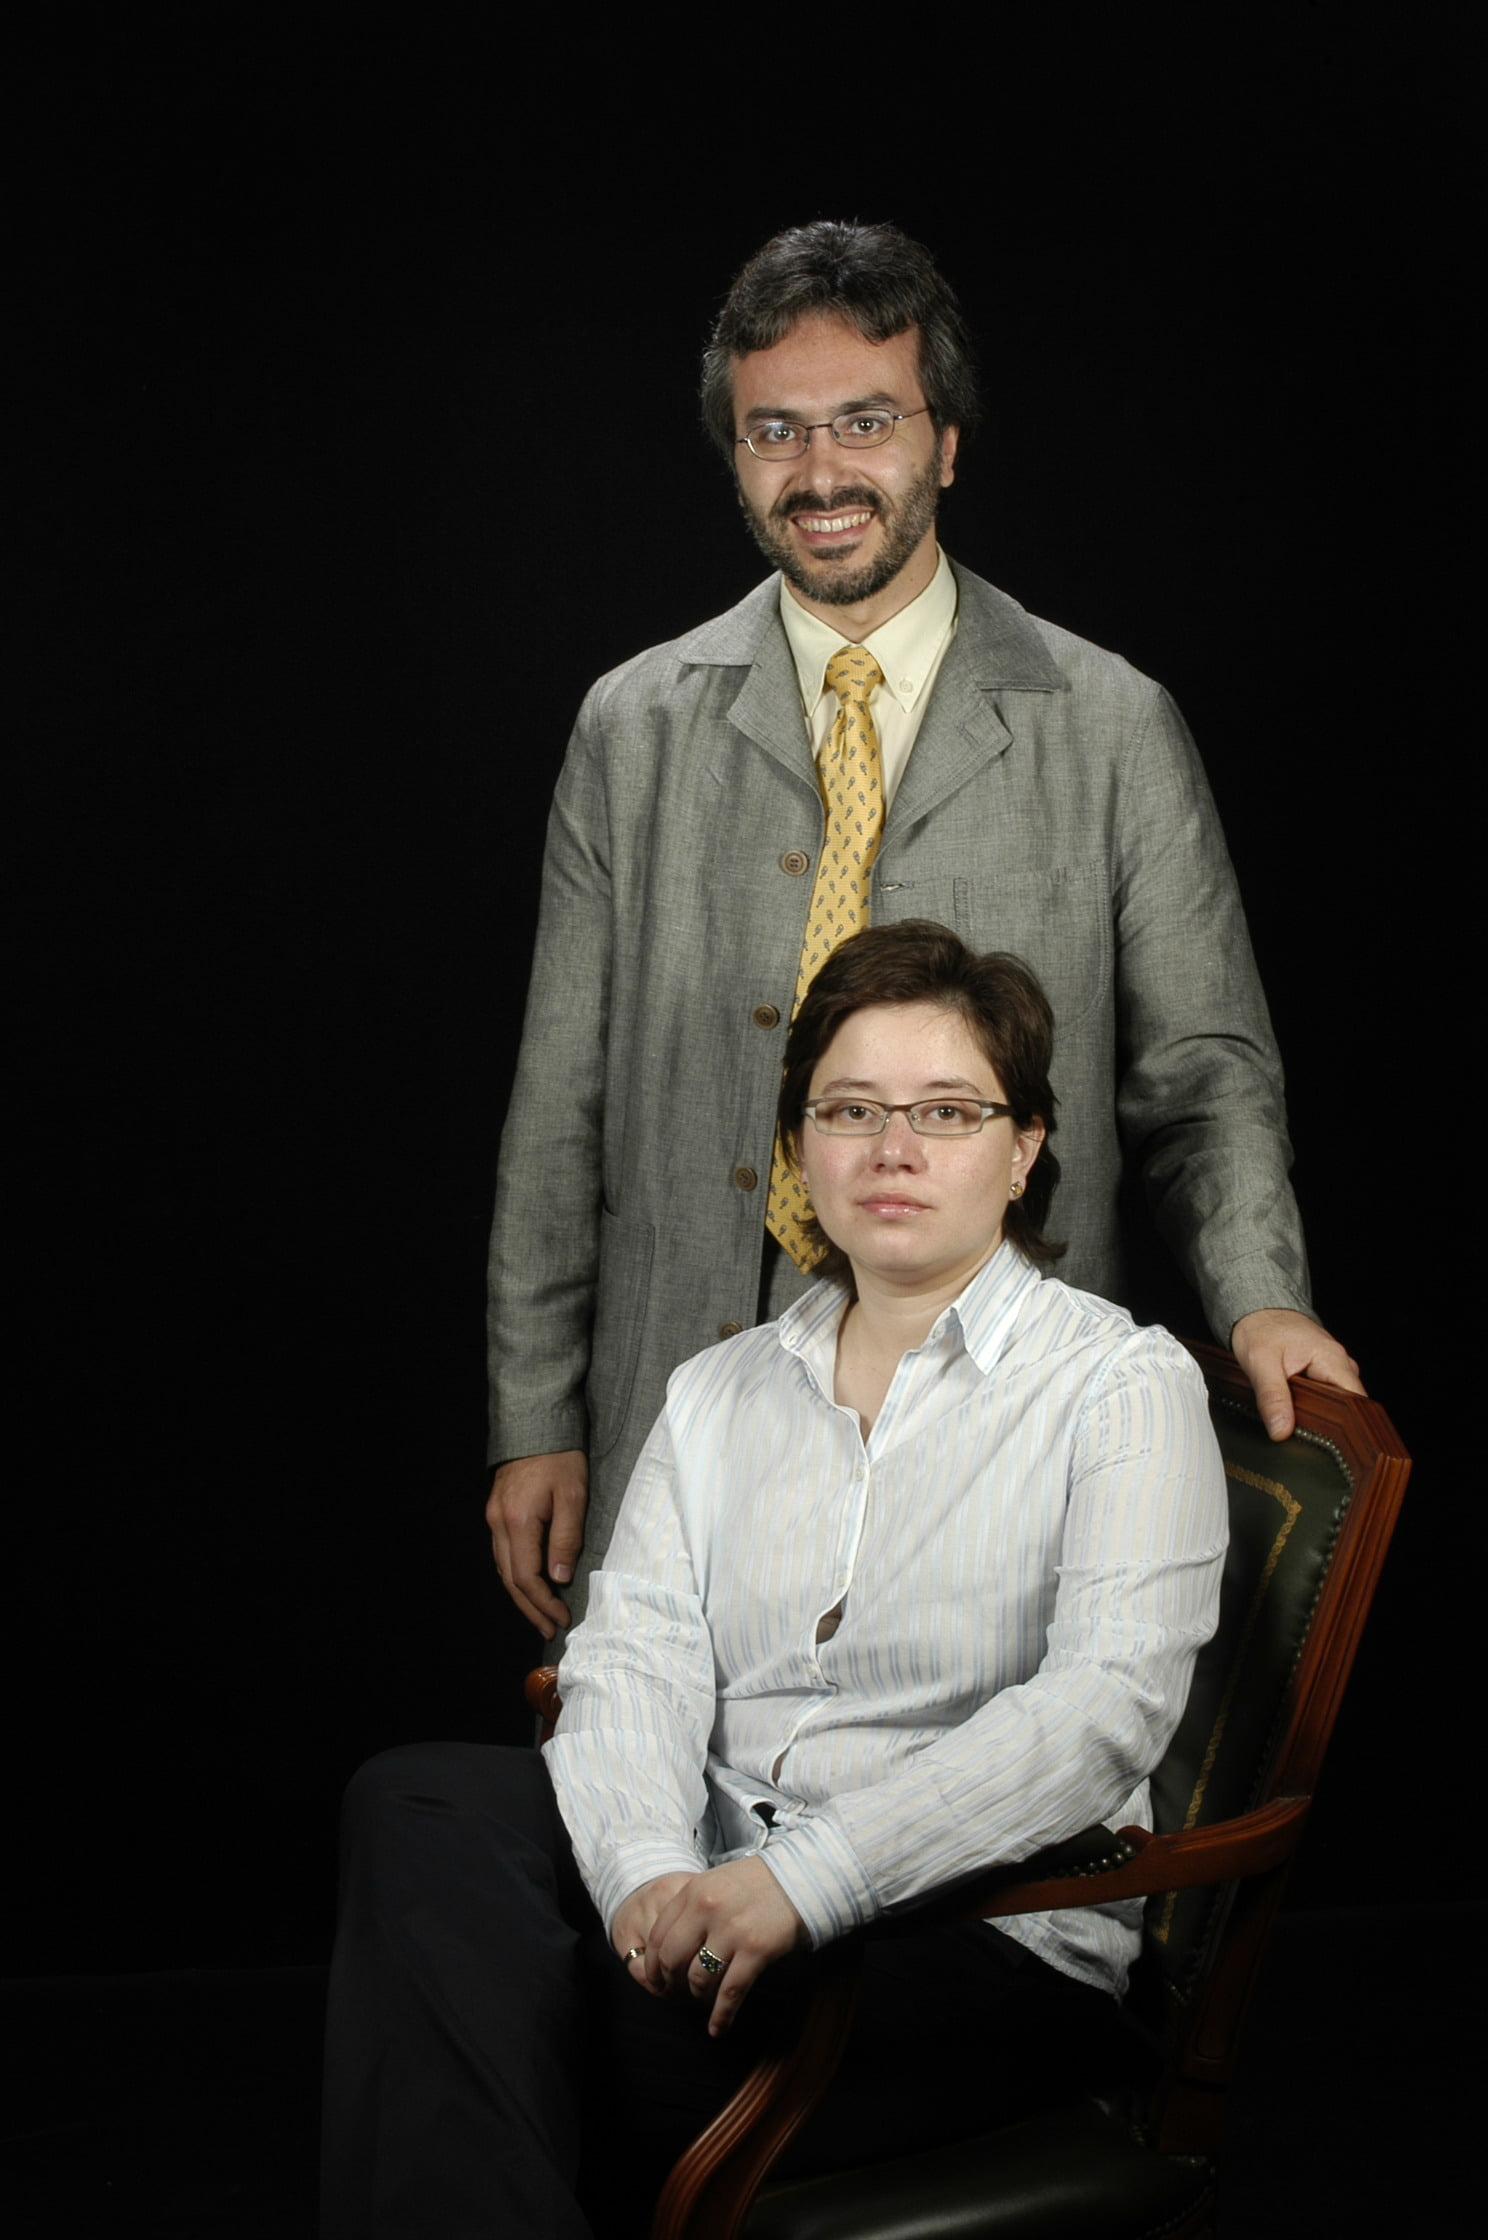 Sr. Magí Lluch i Ariet, Sra.Mariola Mier Pérez